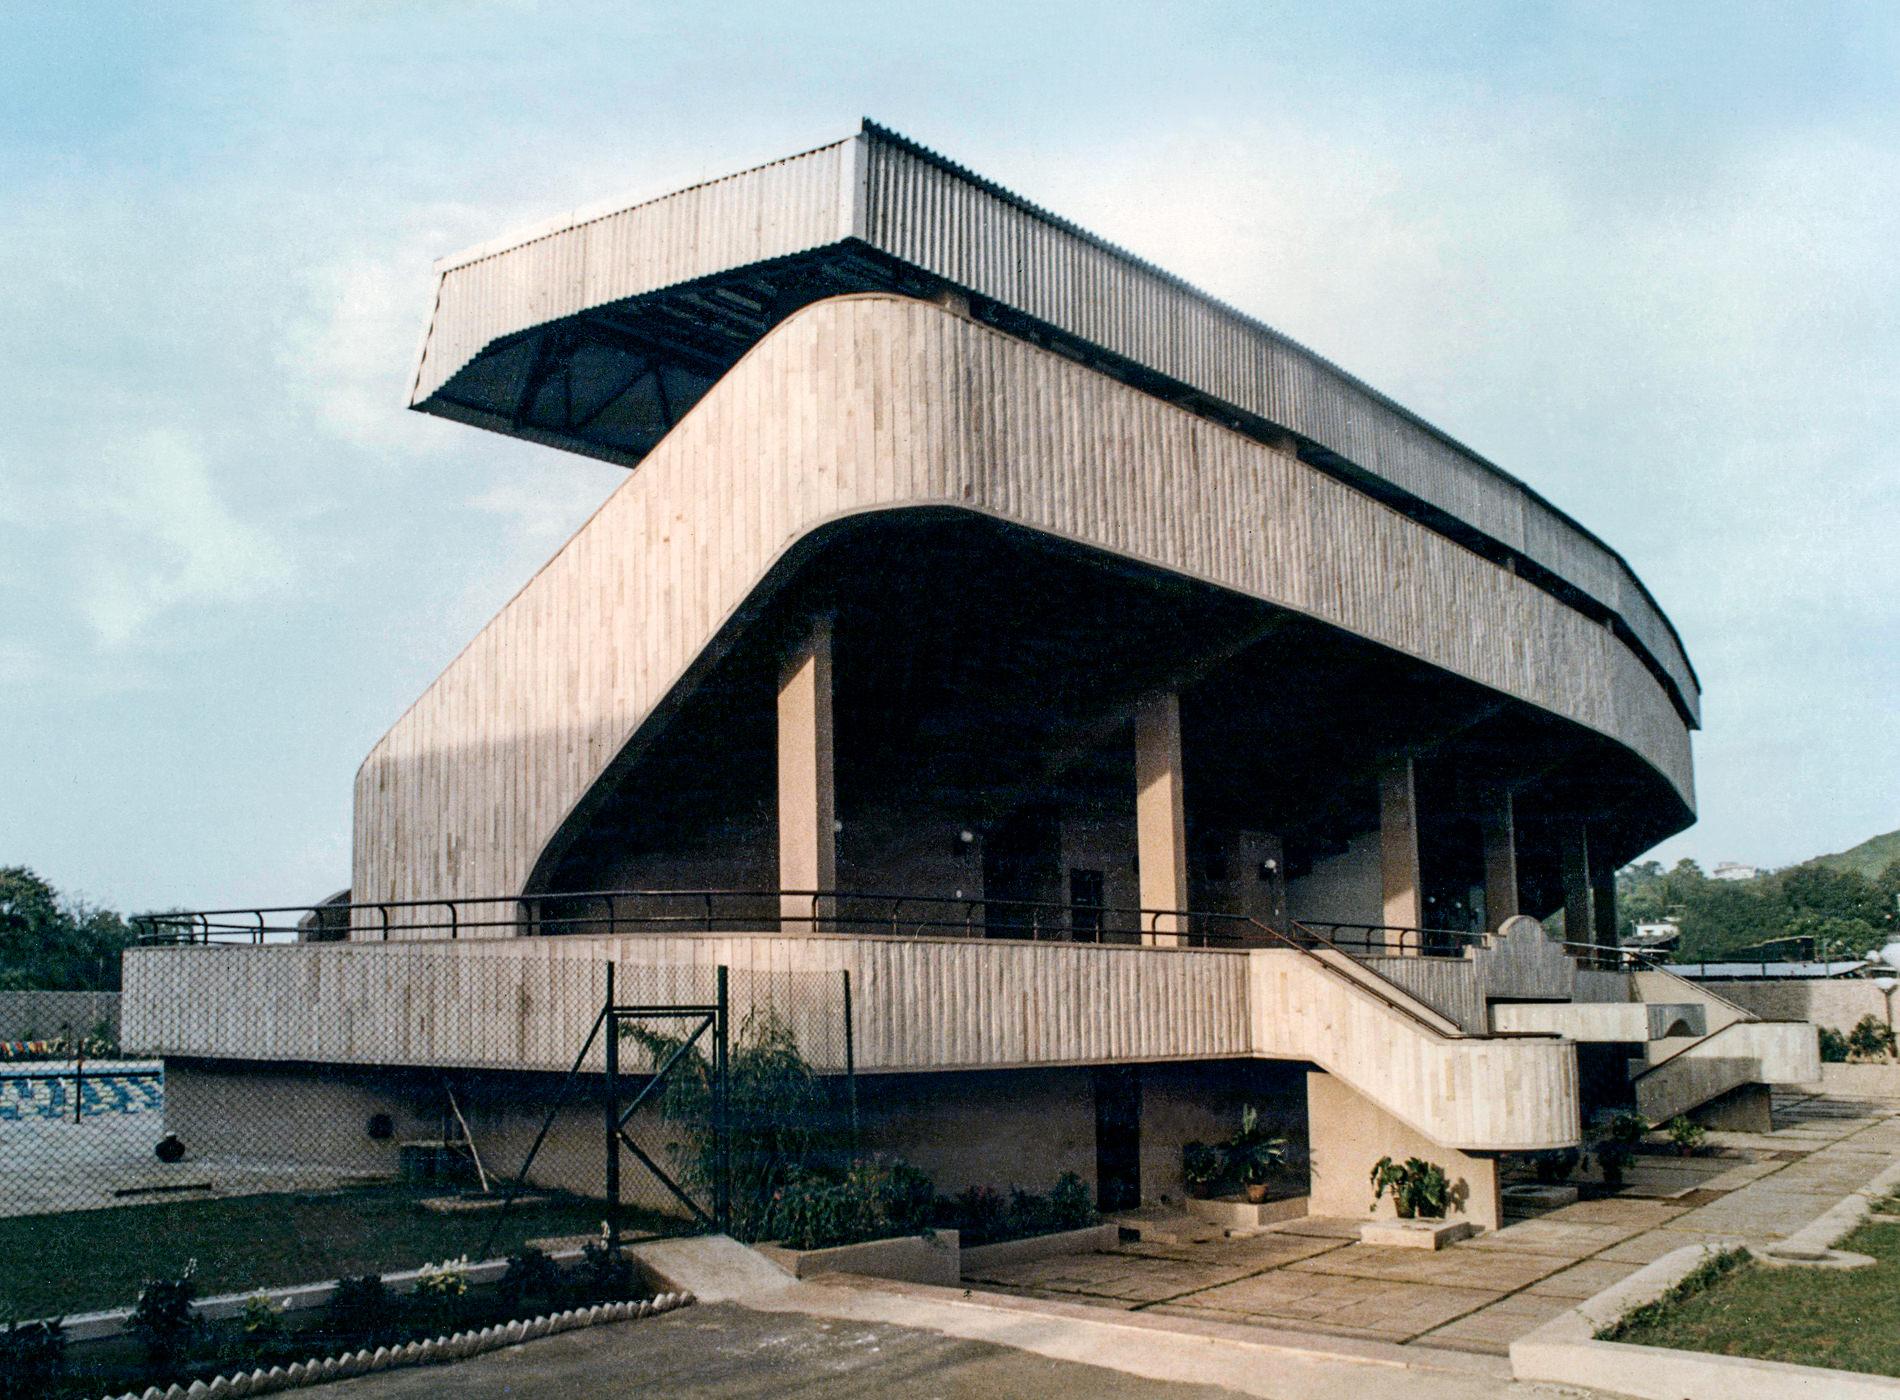 Phaidon Jane Hall, Brinda Somaya, Piscine Olympique Stade, Mumbai, Inde